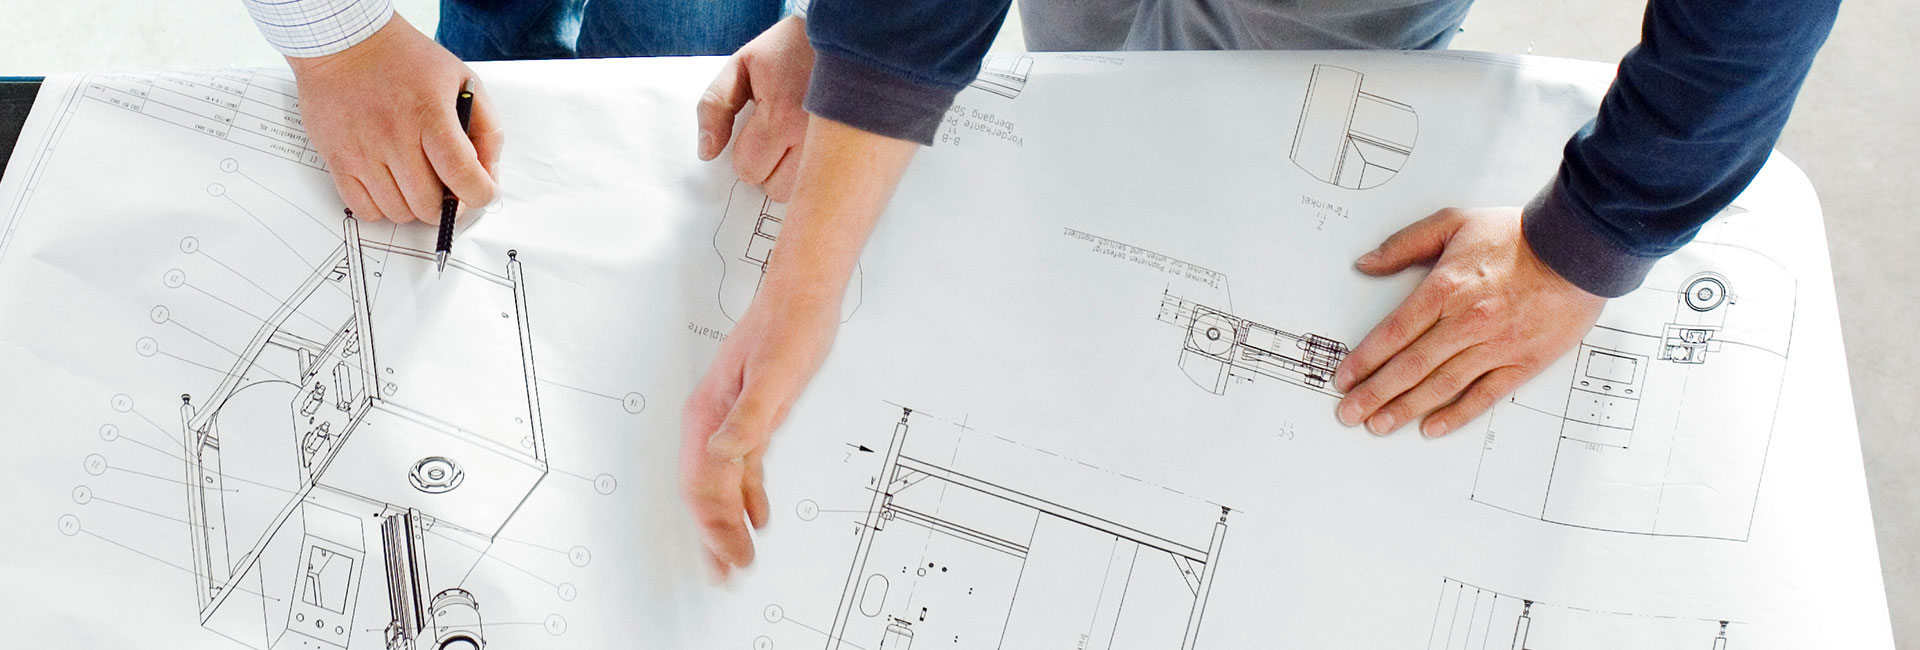 We optimize fabrication processes